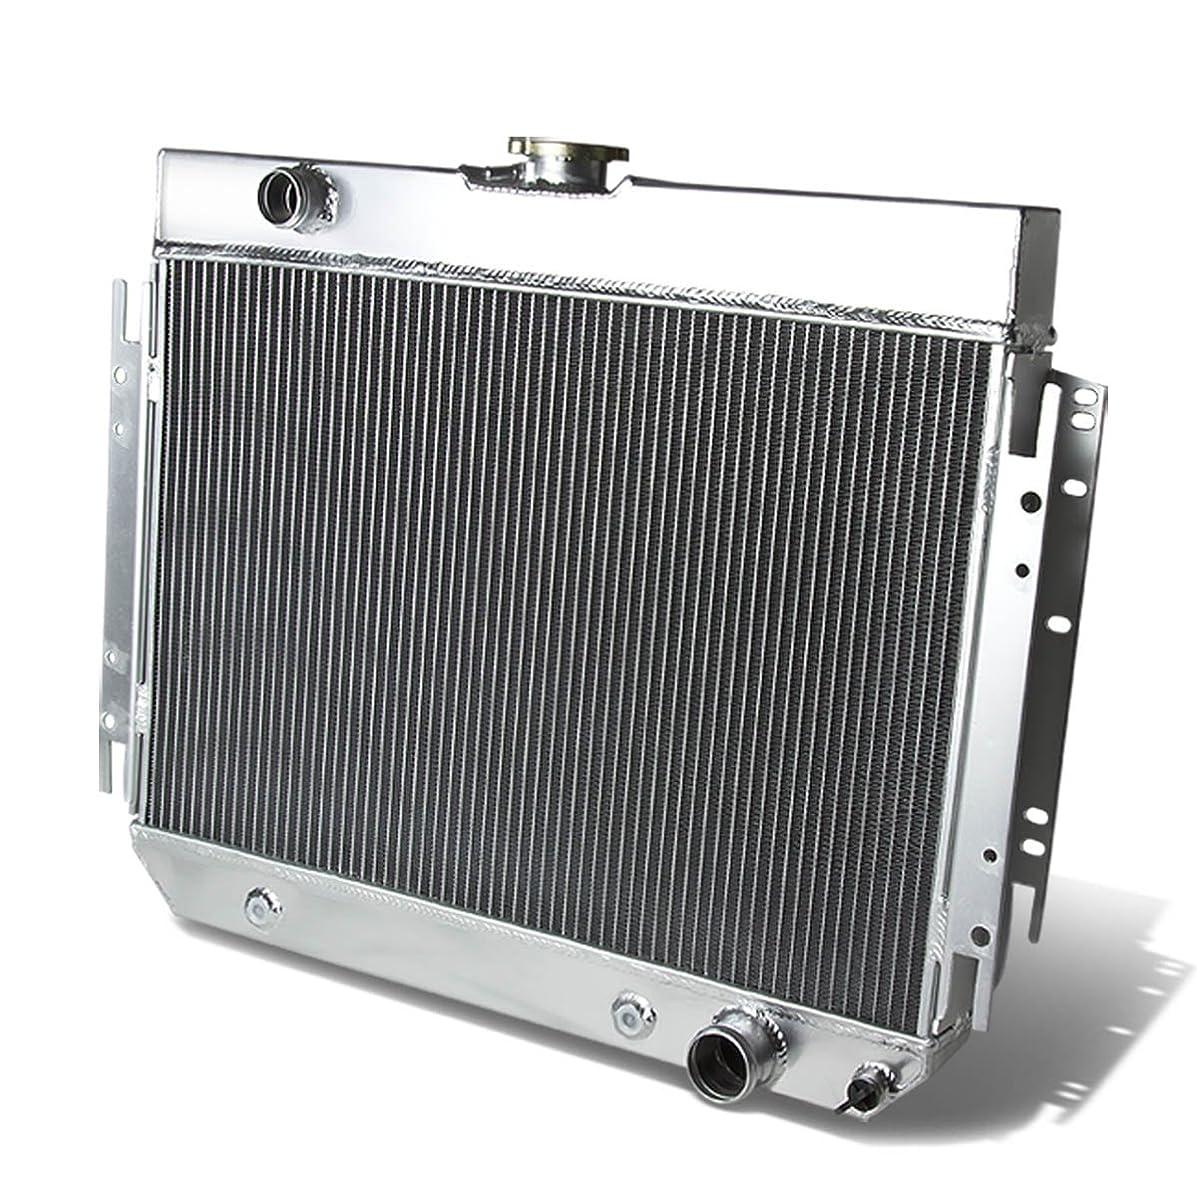 DNA Motoring RA-MID64-2 Aluminum Racing Radiator